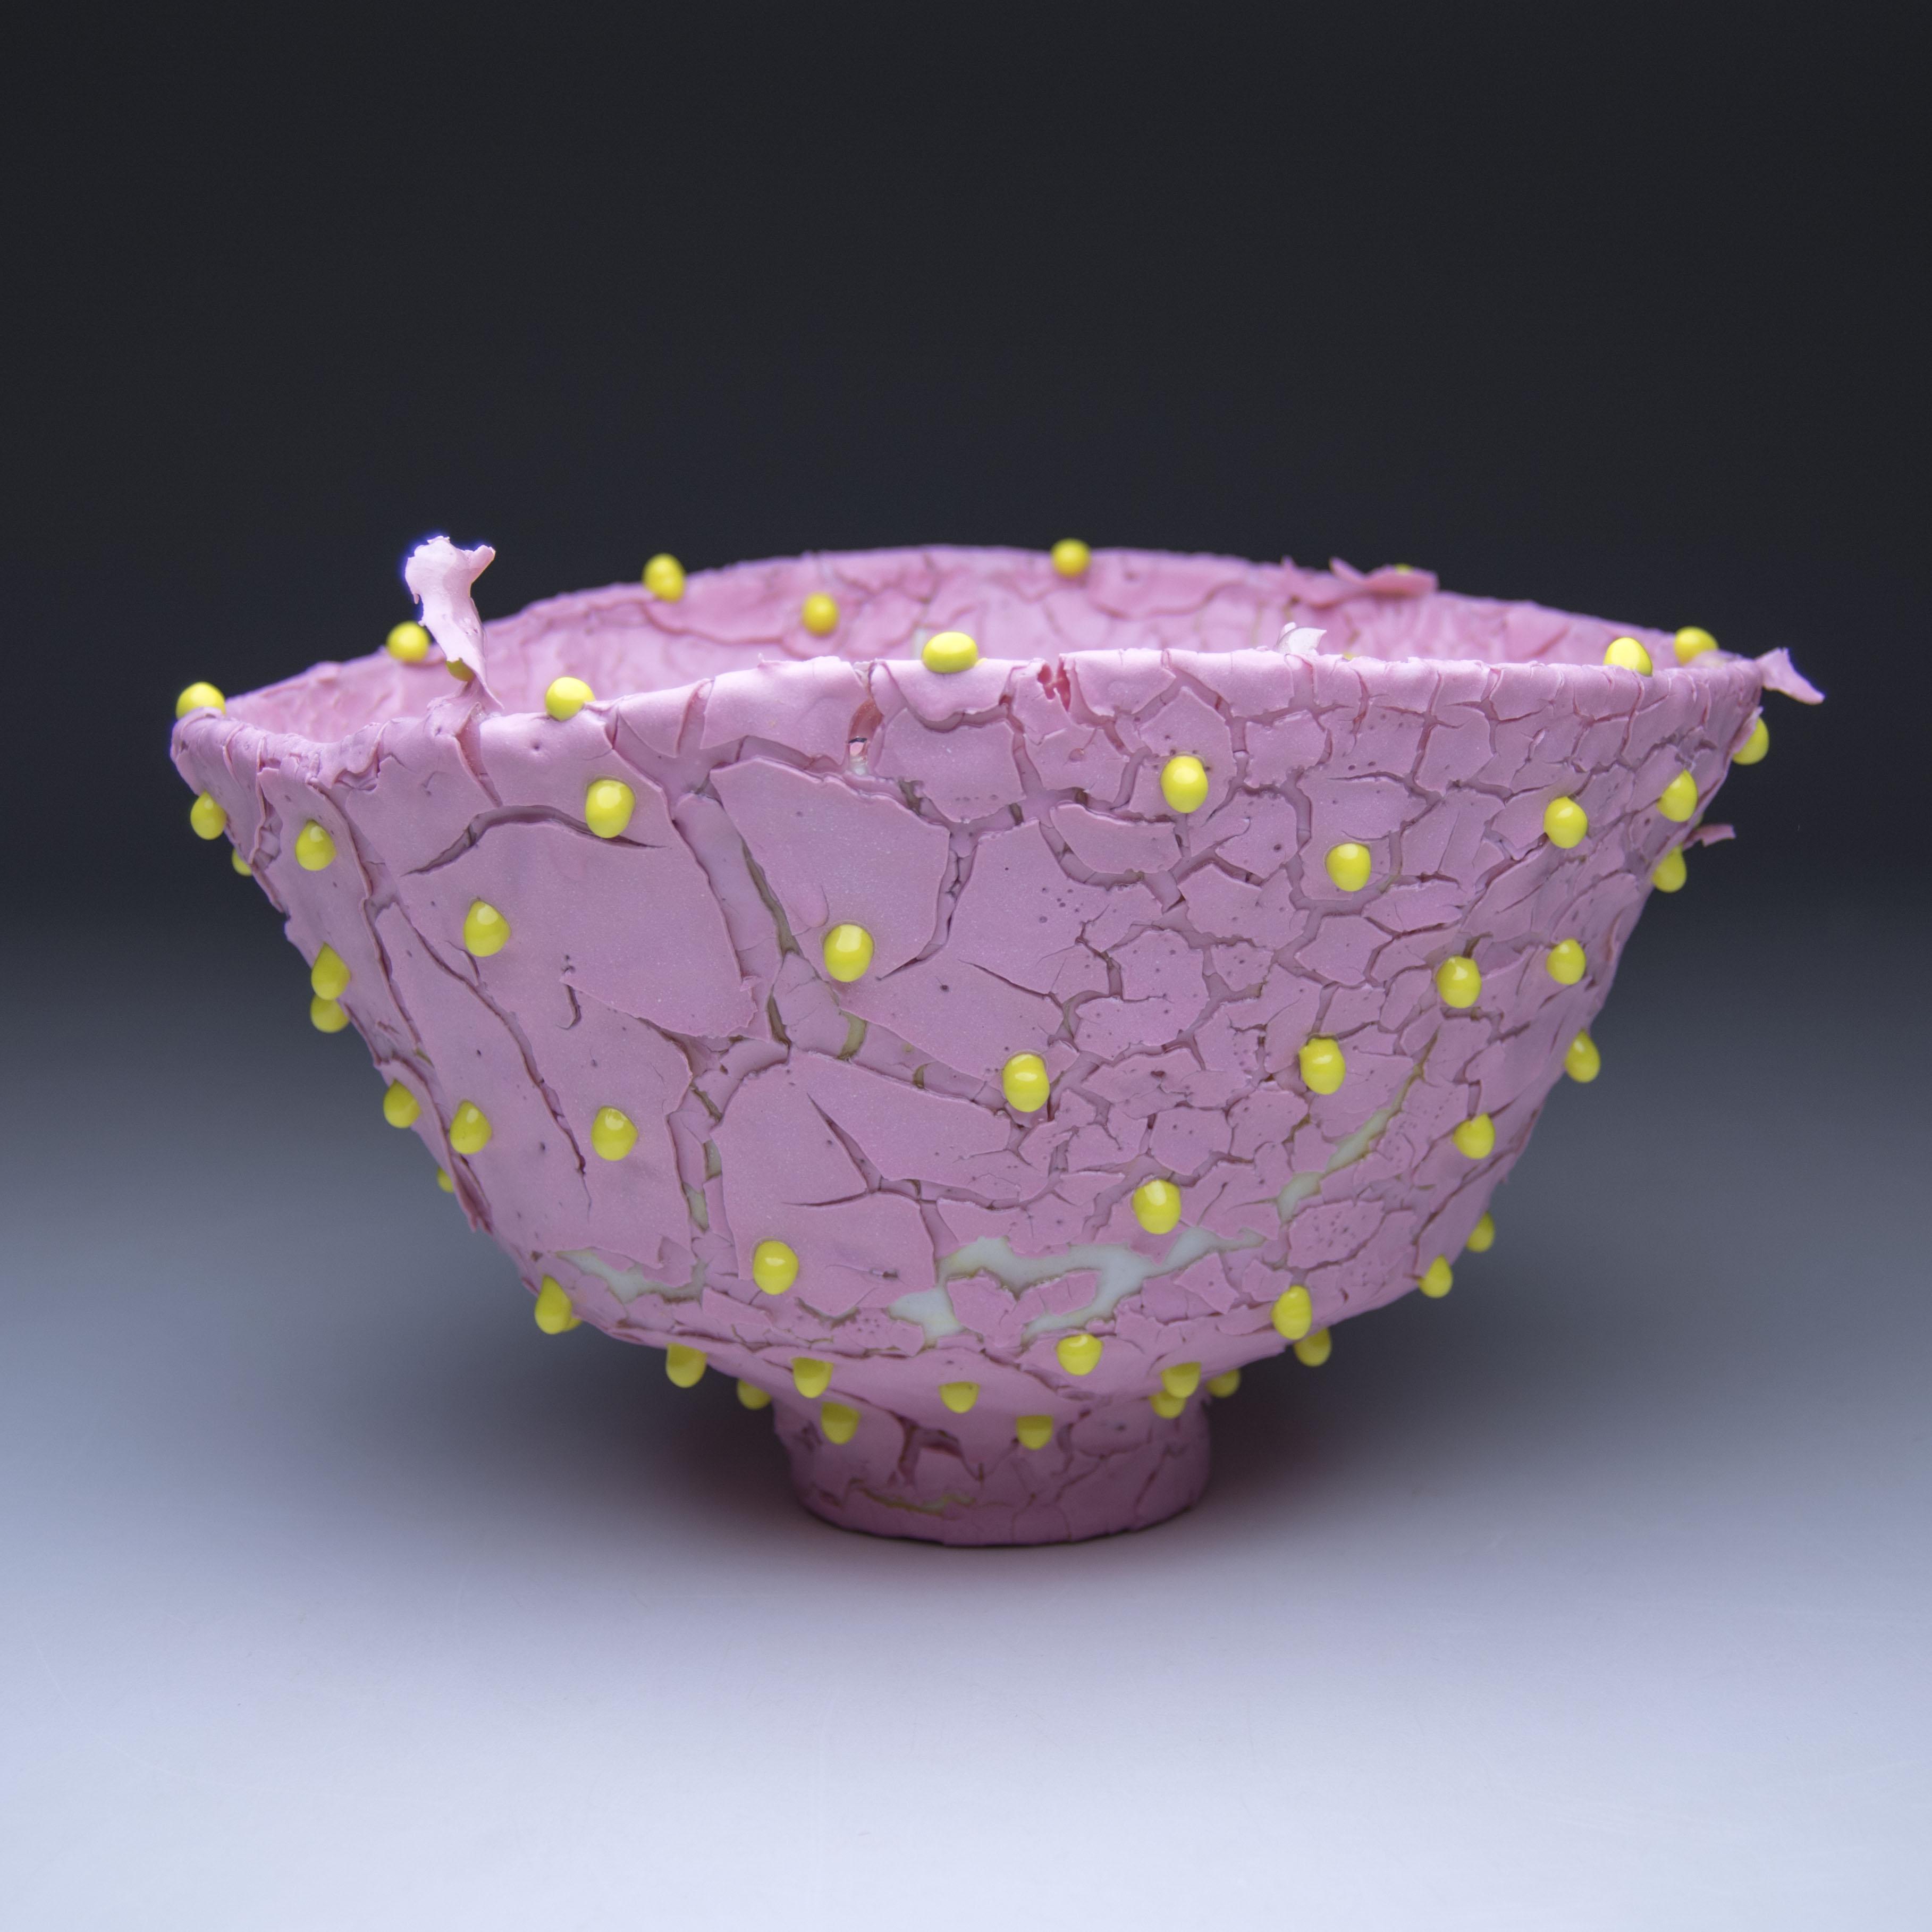 Kiyoshi Kaneshiro, <em> Bowl (3) </em>, 2019. Porcelain and glaze, 5 x 9 x 9 inches (12.7 x 22.9 x 22.9 cm)